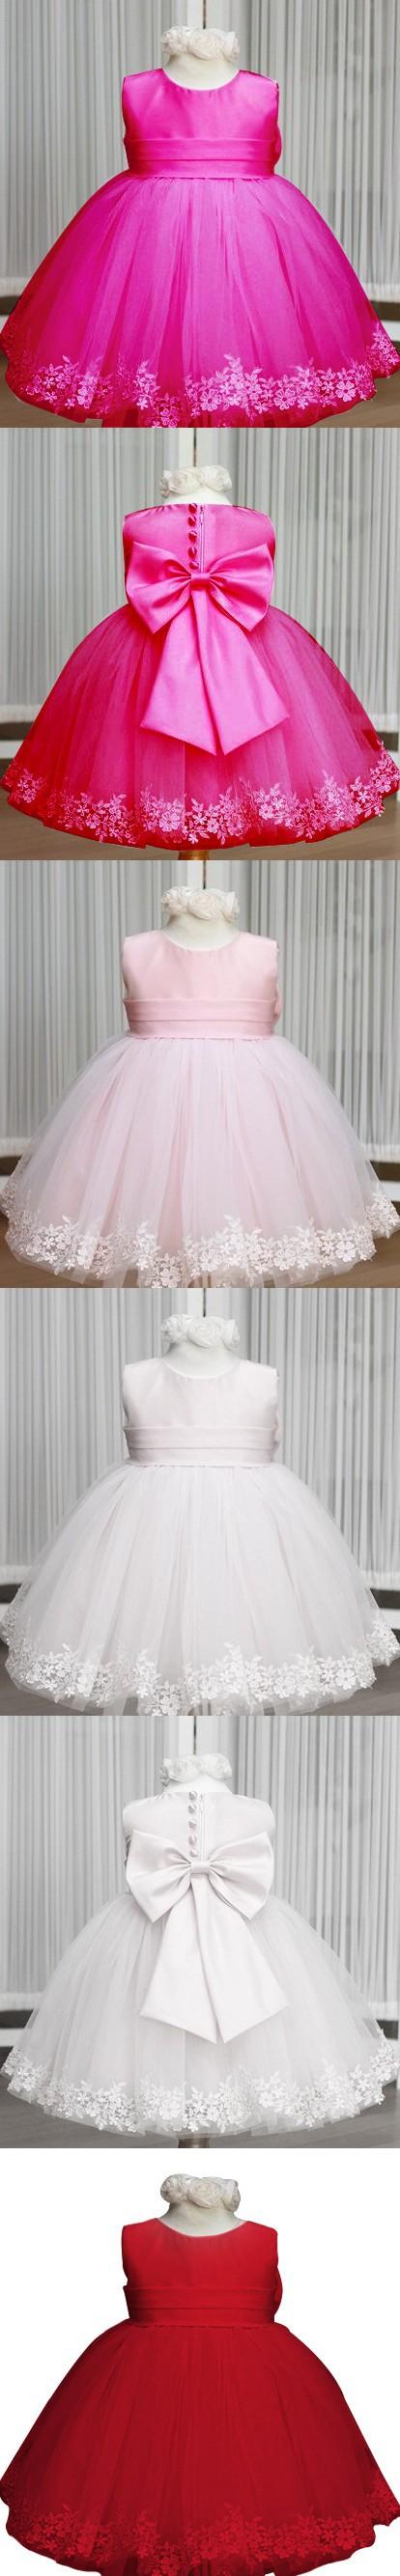 Girls lace tutu dresses girl summer sleeveless dress children